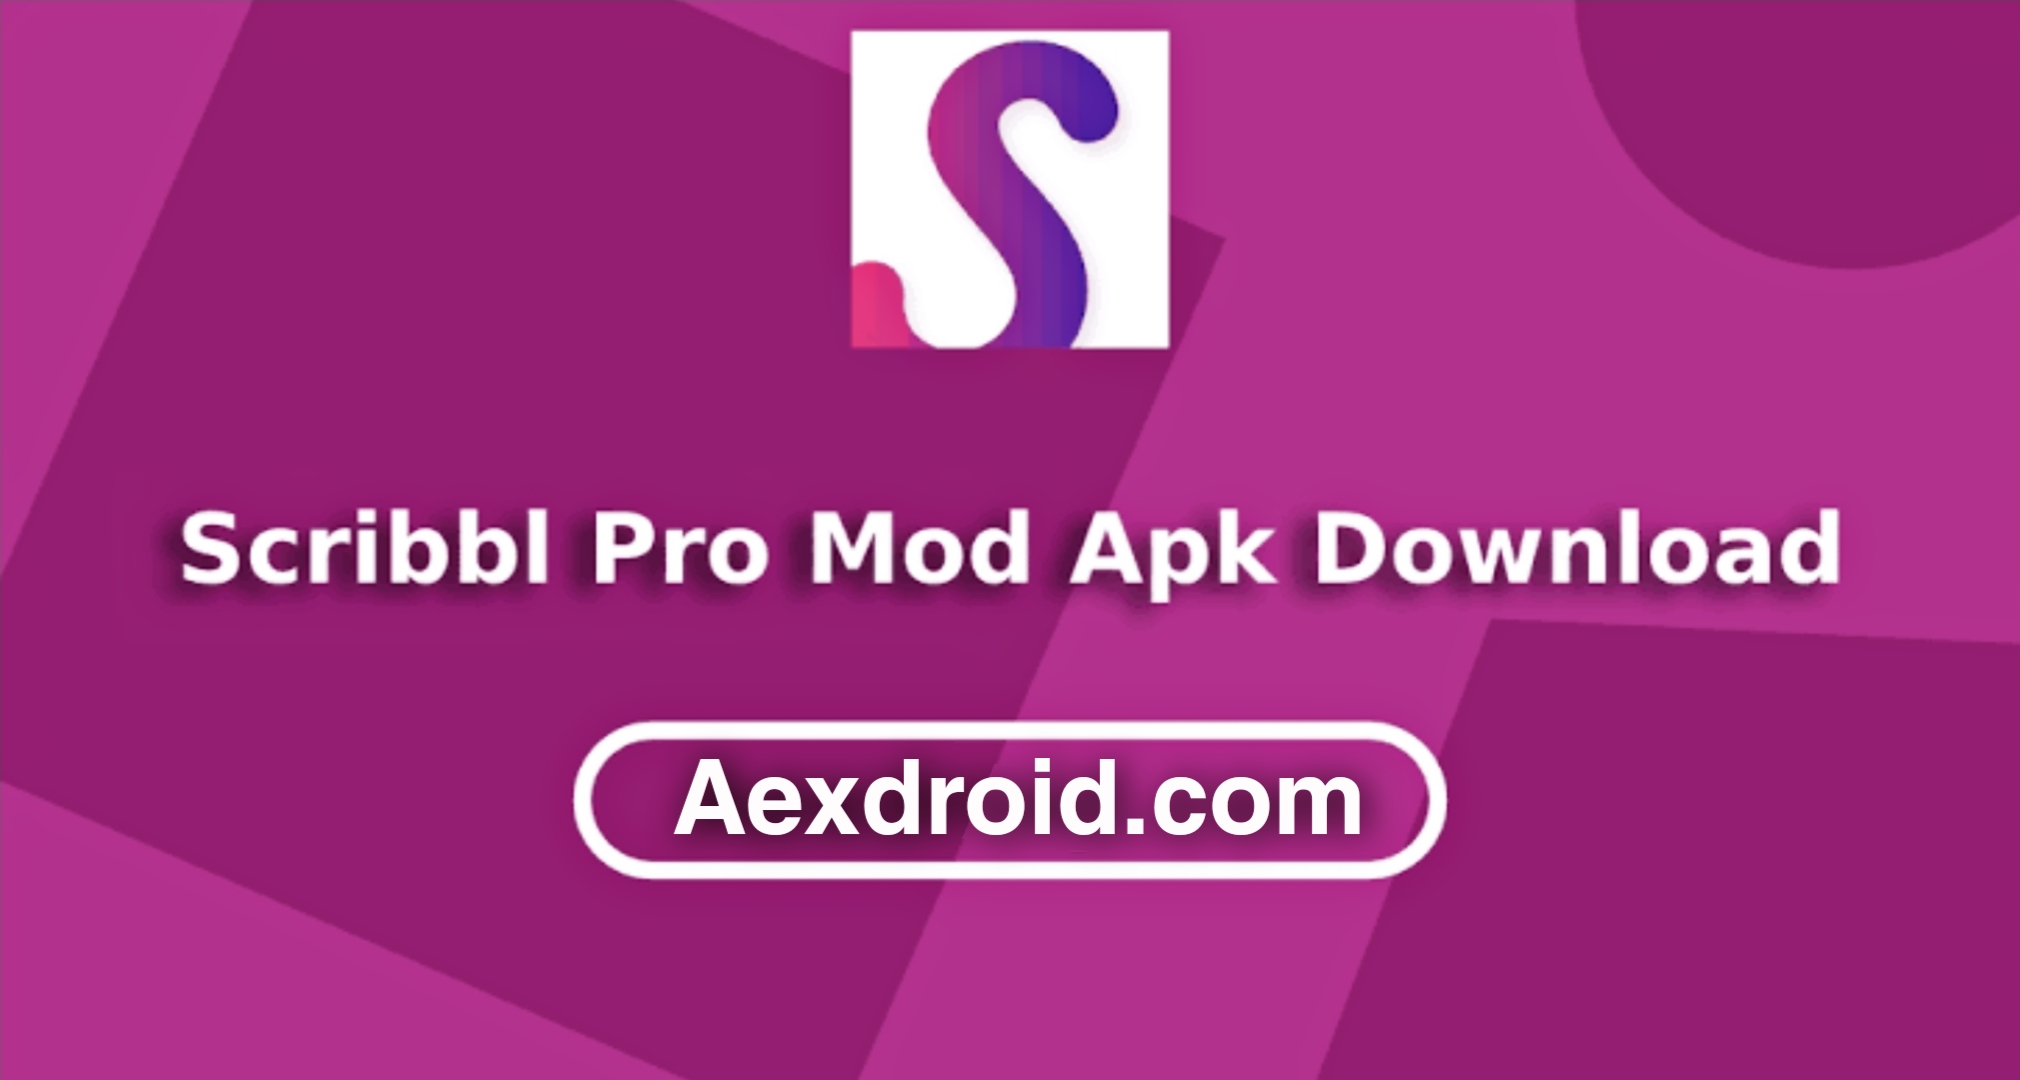 Scribbl Mod Pro Apk Download 2020 Unlocked